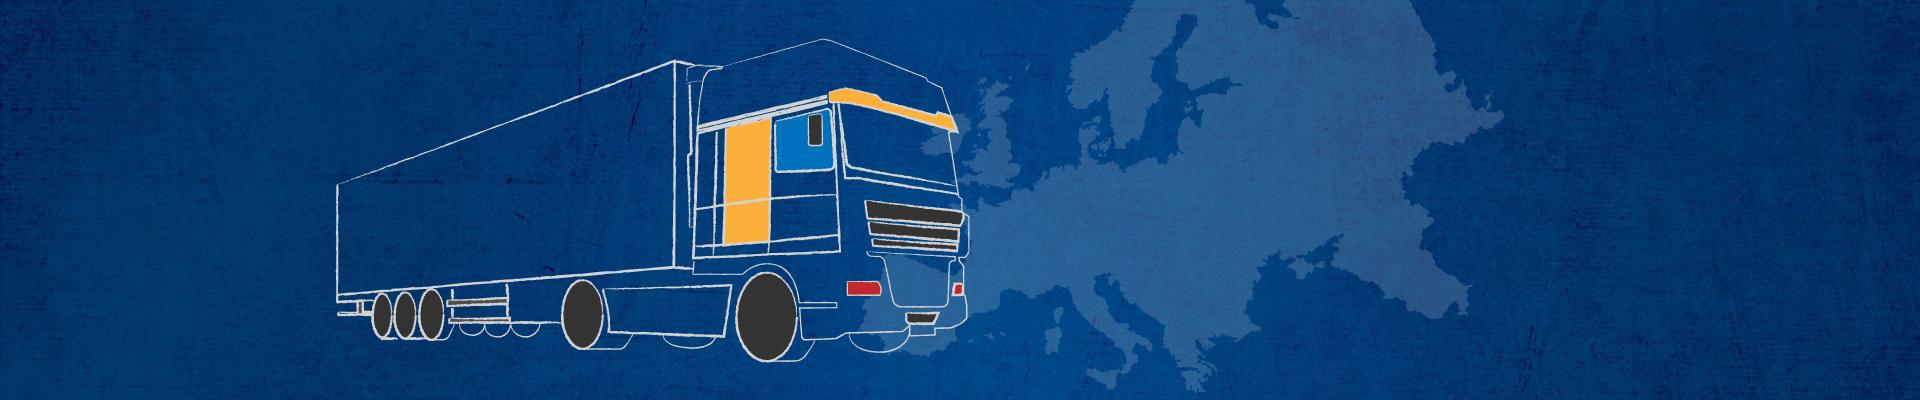 Trasporti nazionali e internazionali